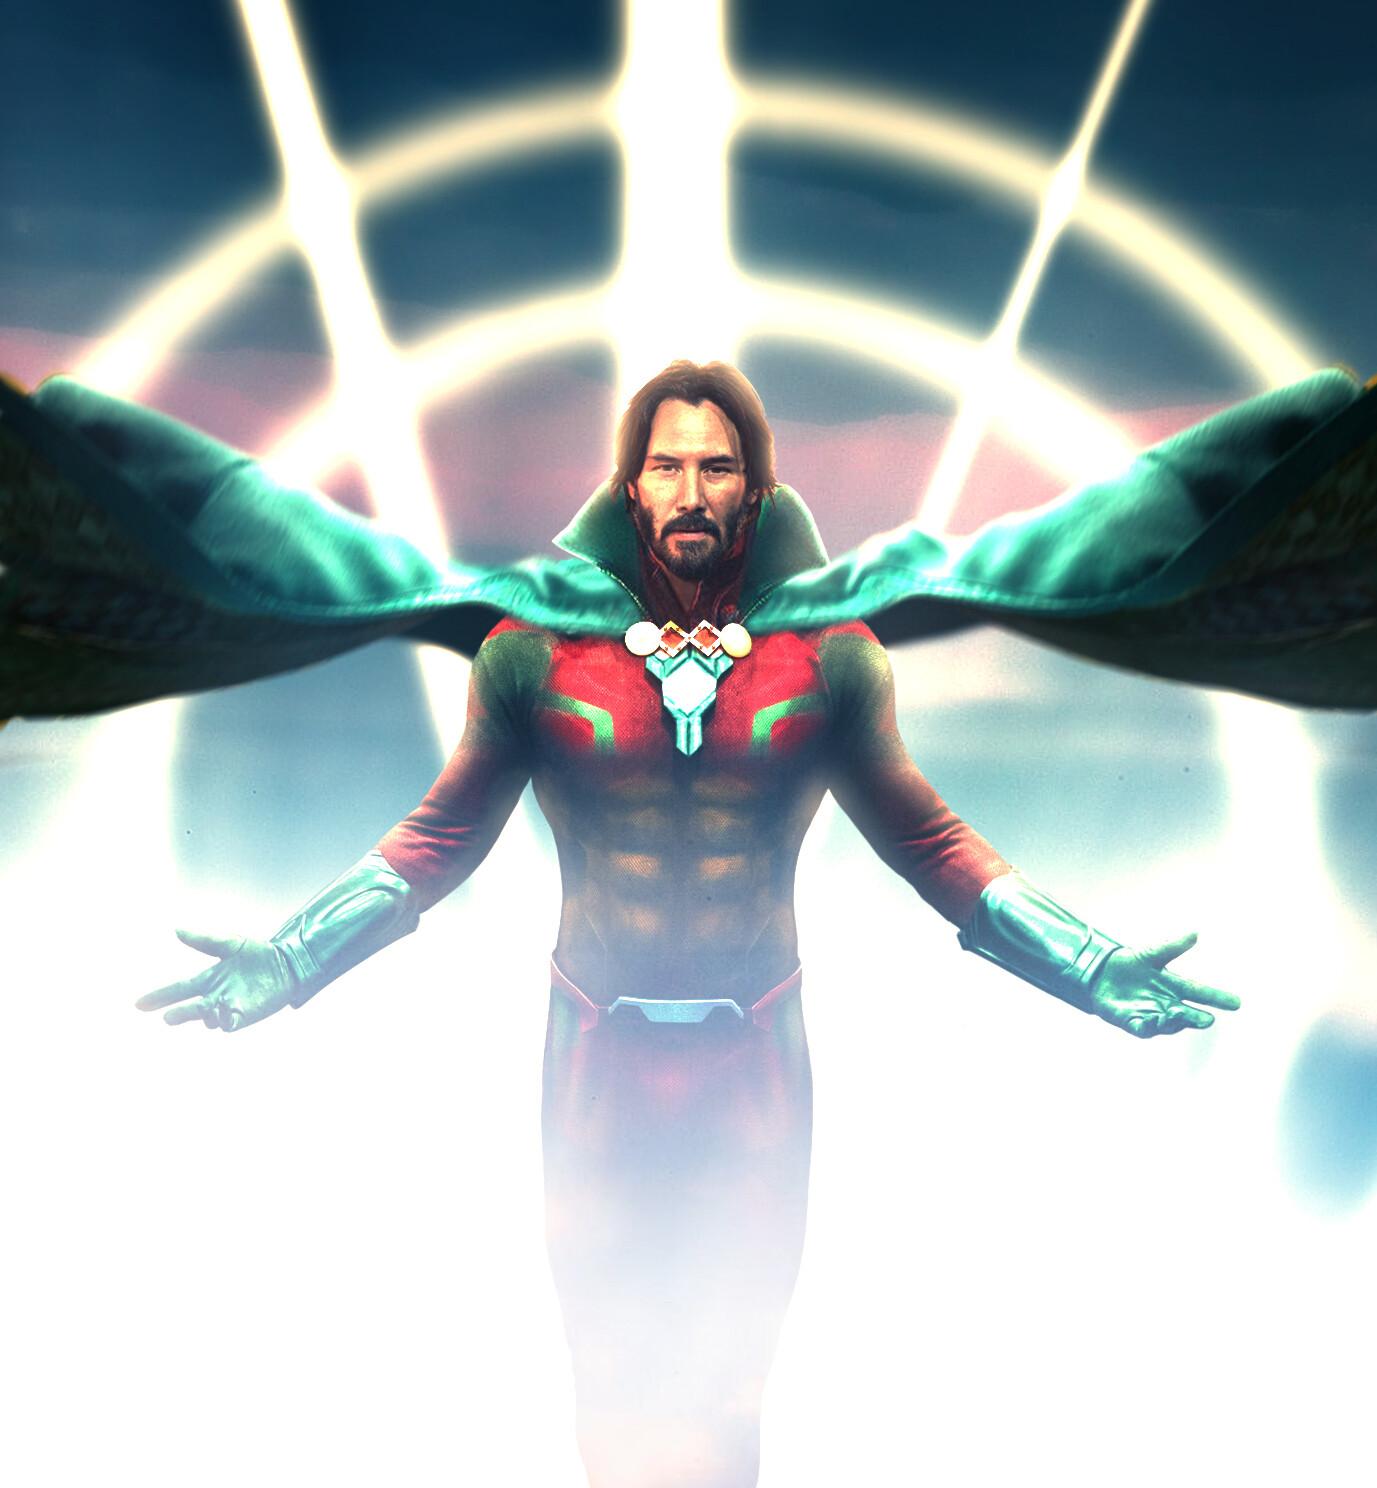 La Cour des Miracles contre les Omega Titans [LIBRE] Renzo-mejia-montes-mrmiracle